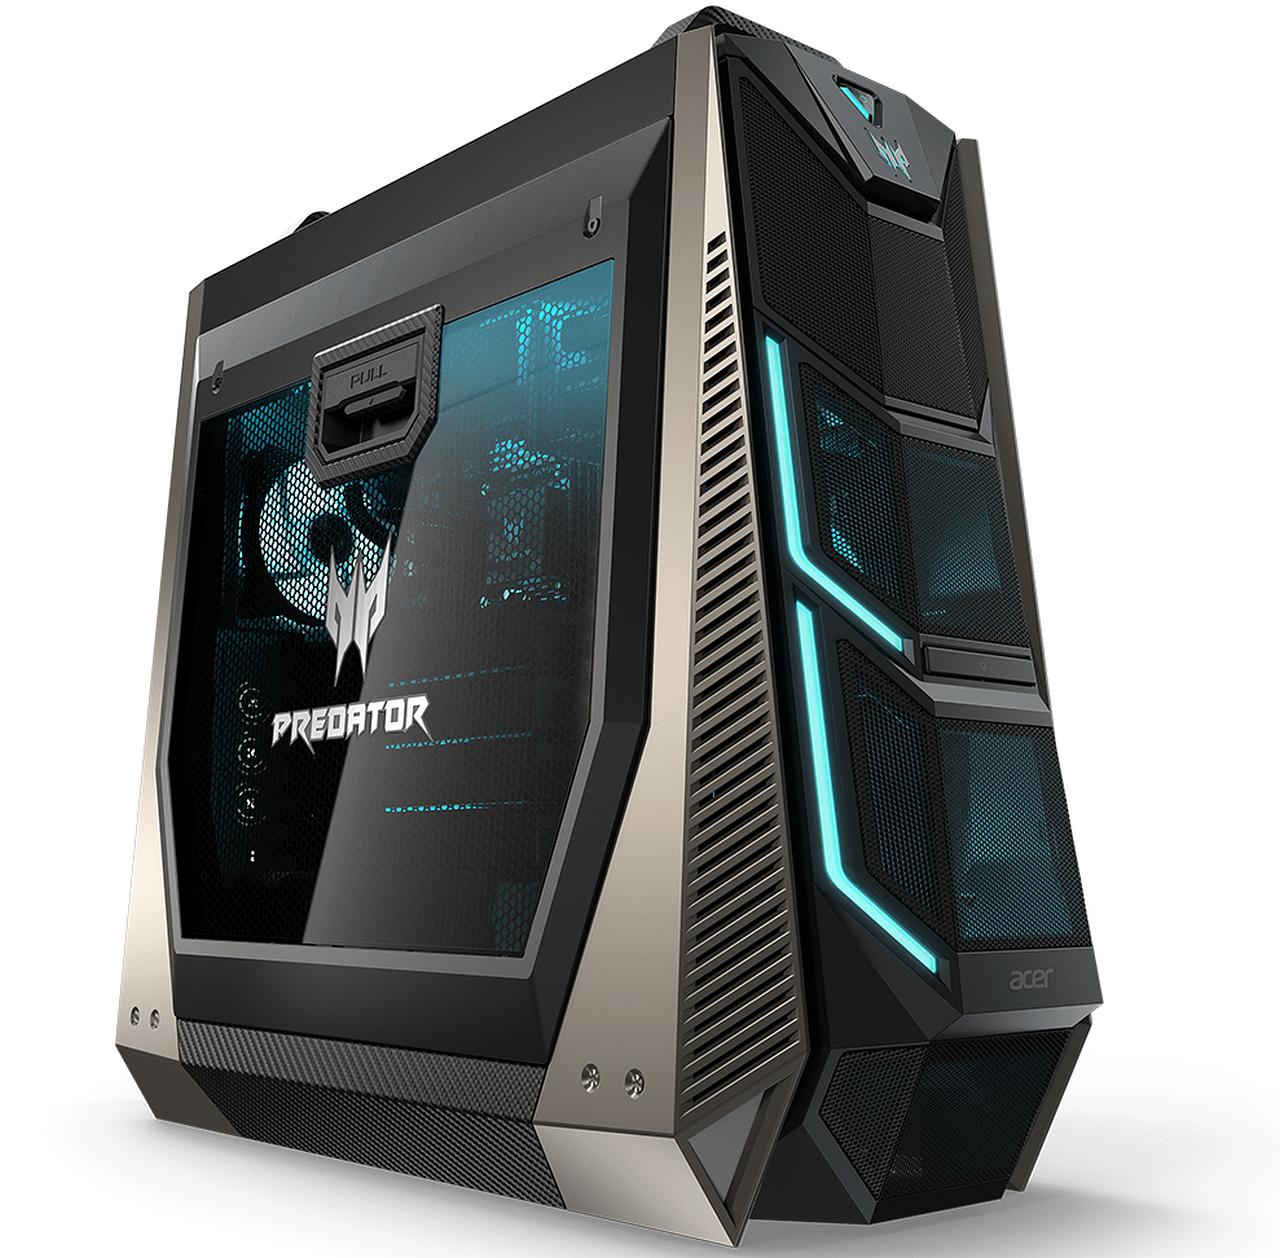 【IFA 2017】Acer Predator Orion 9000:18 核 CPU + 4 張顯示卡